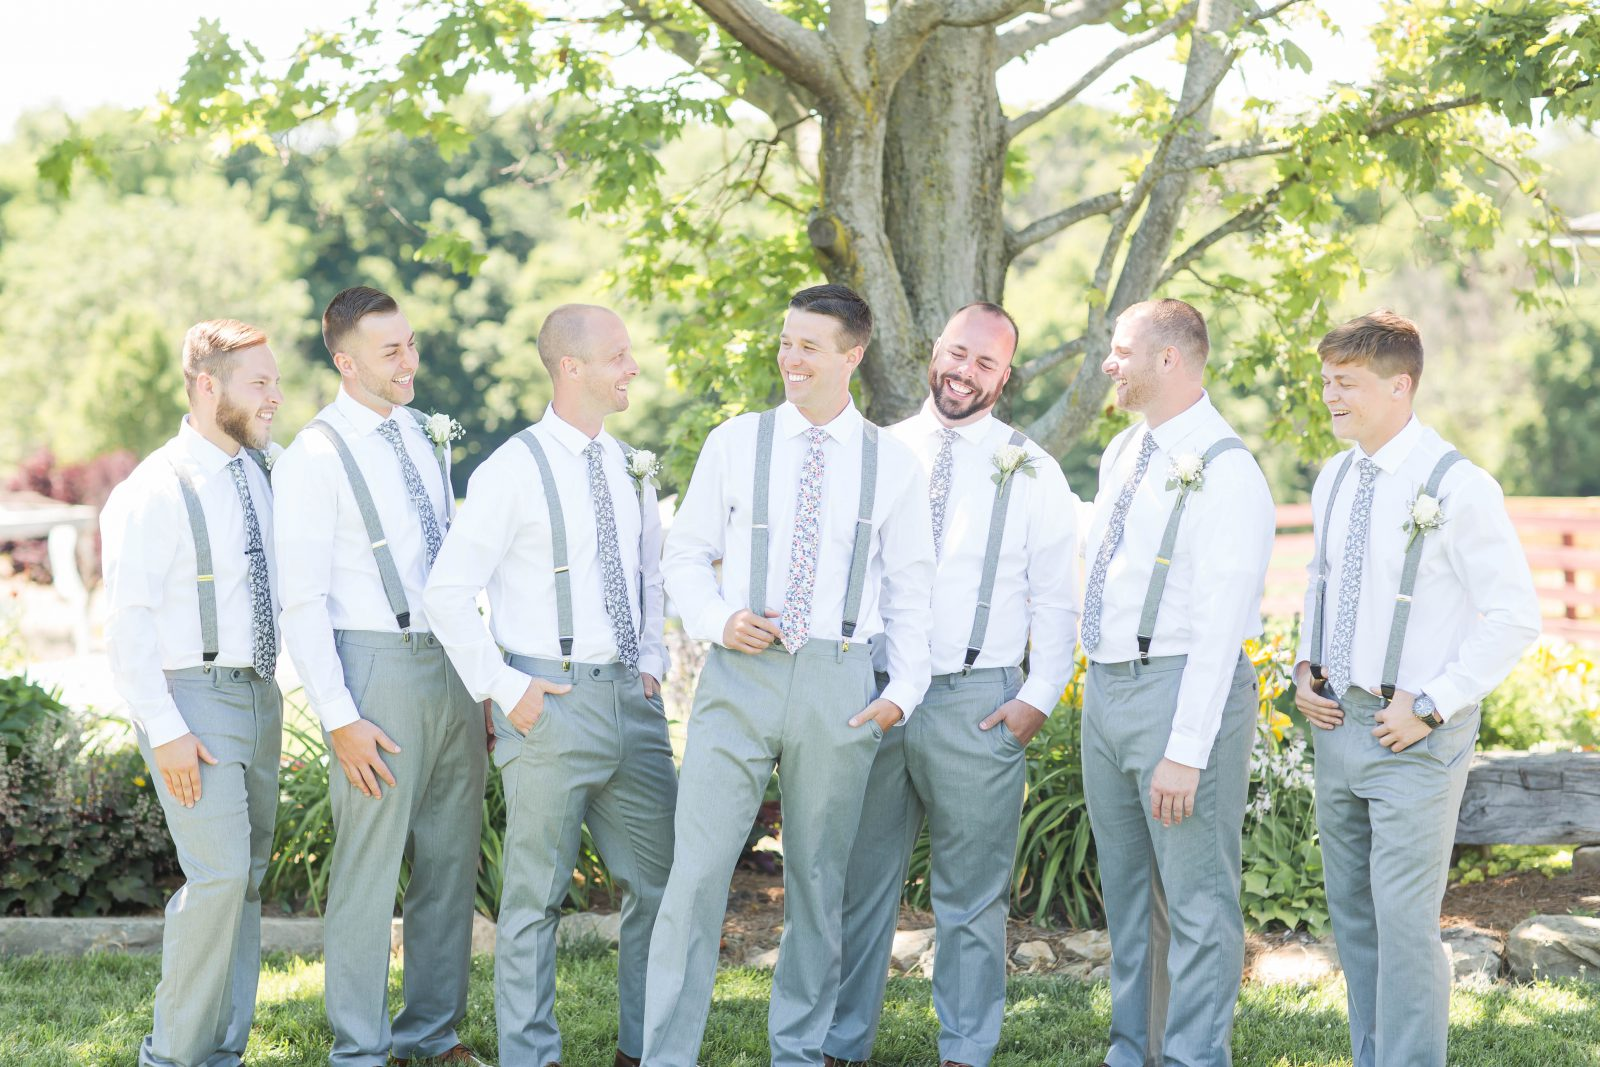 peacock-ridge-summer-wedding-photographer-akron-ohio-loren-jackson-photography-66